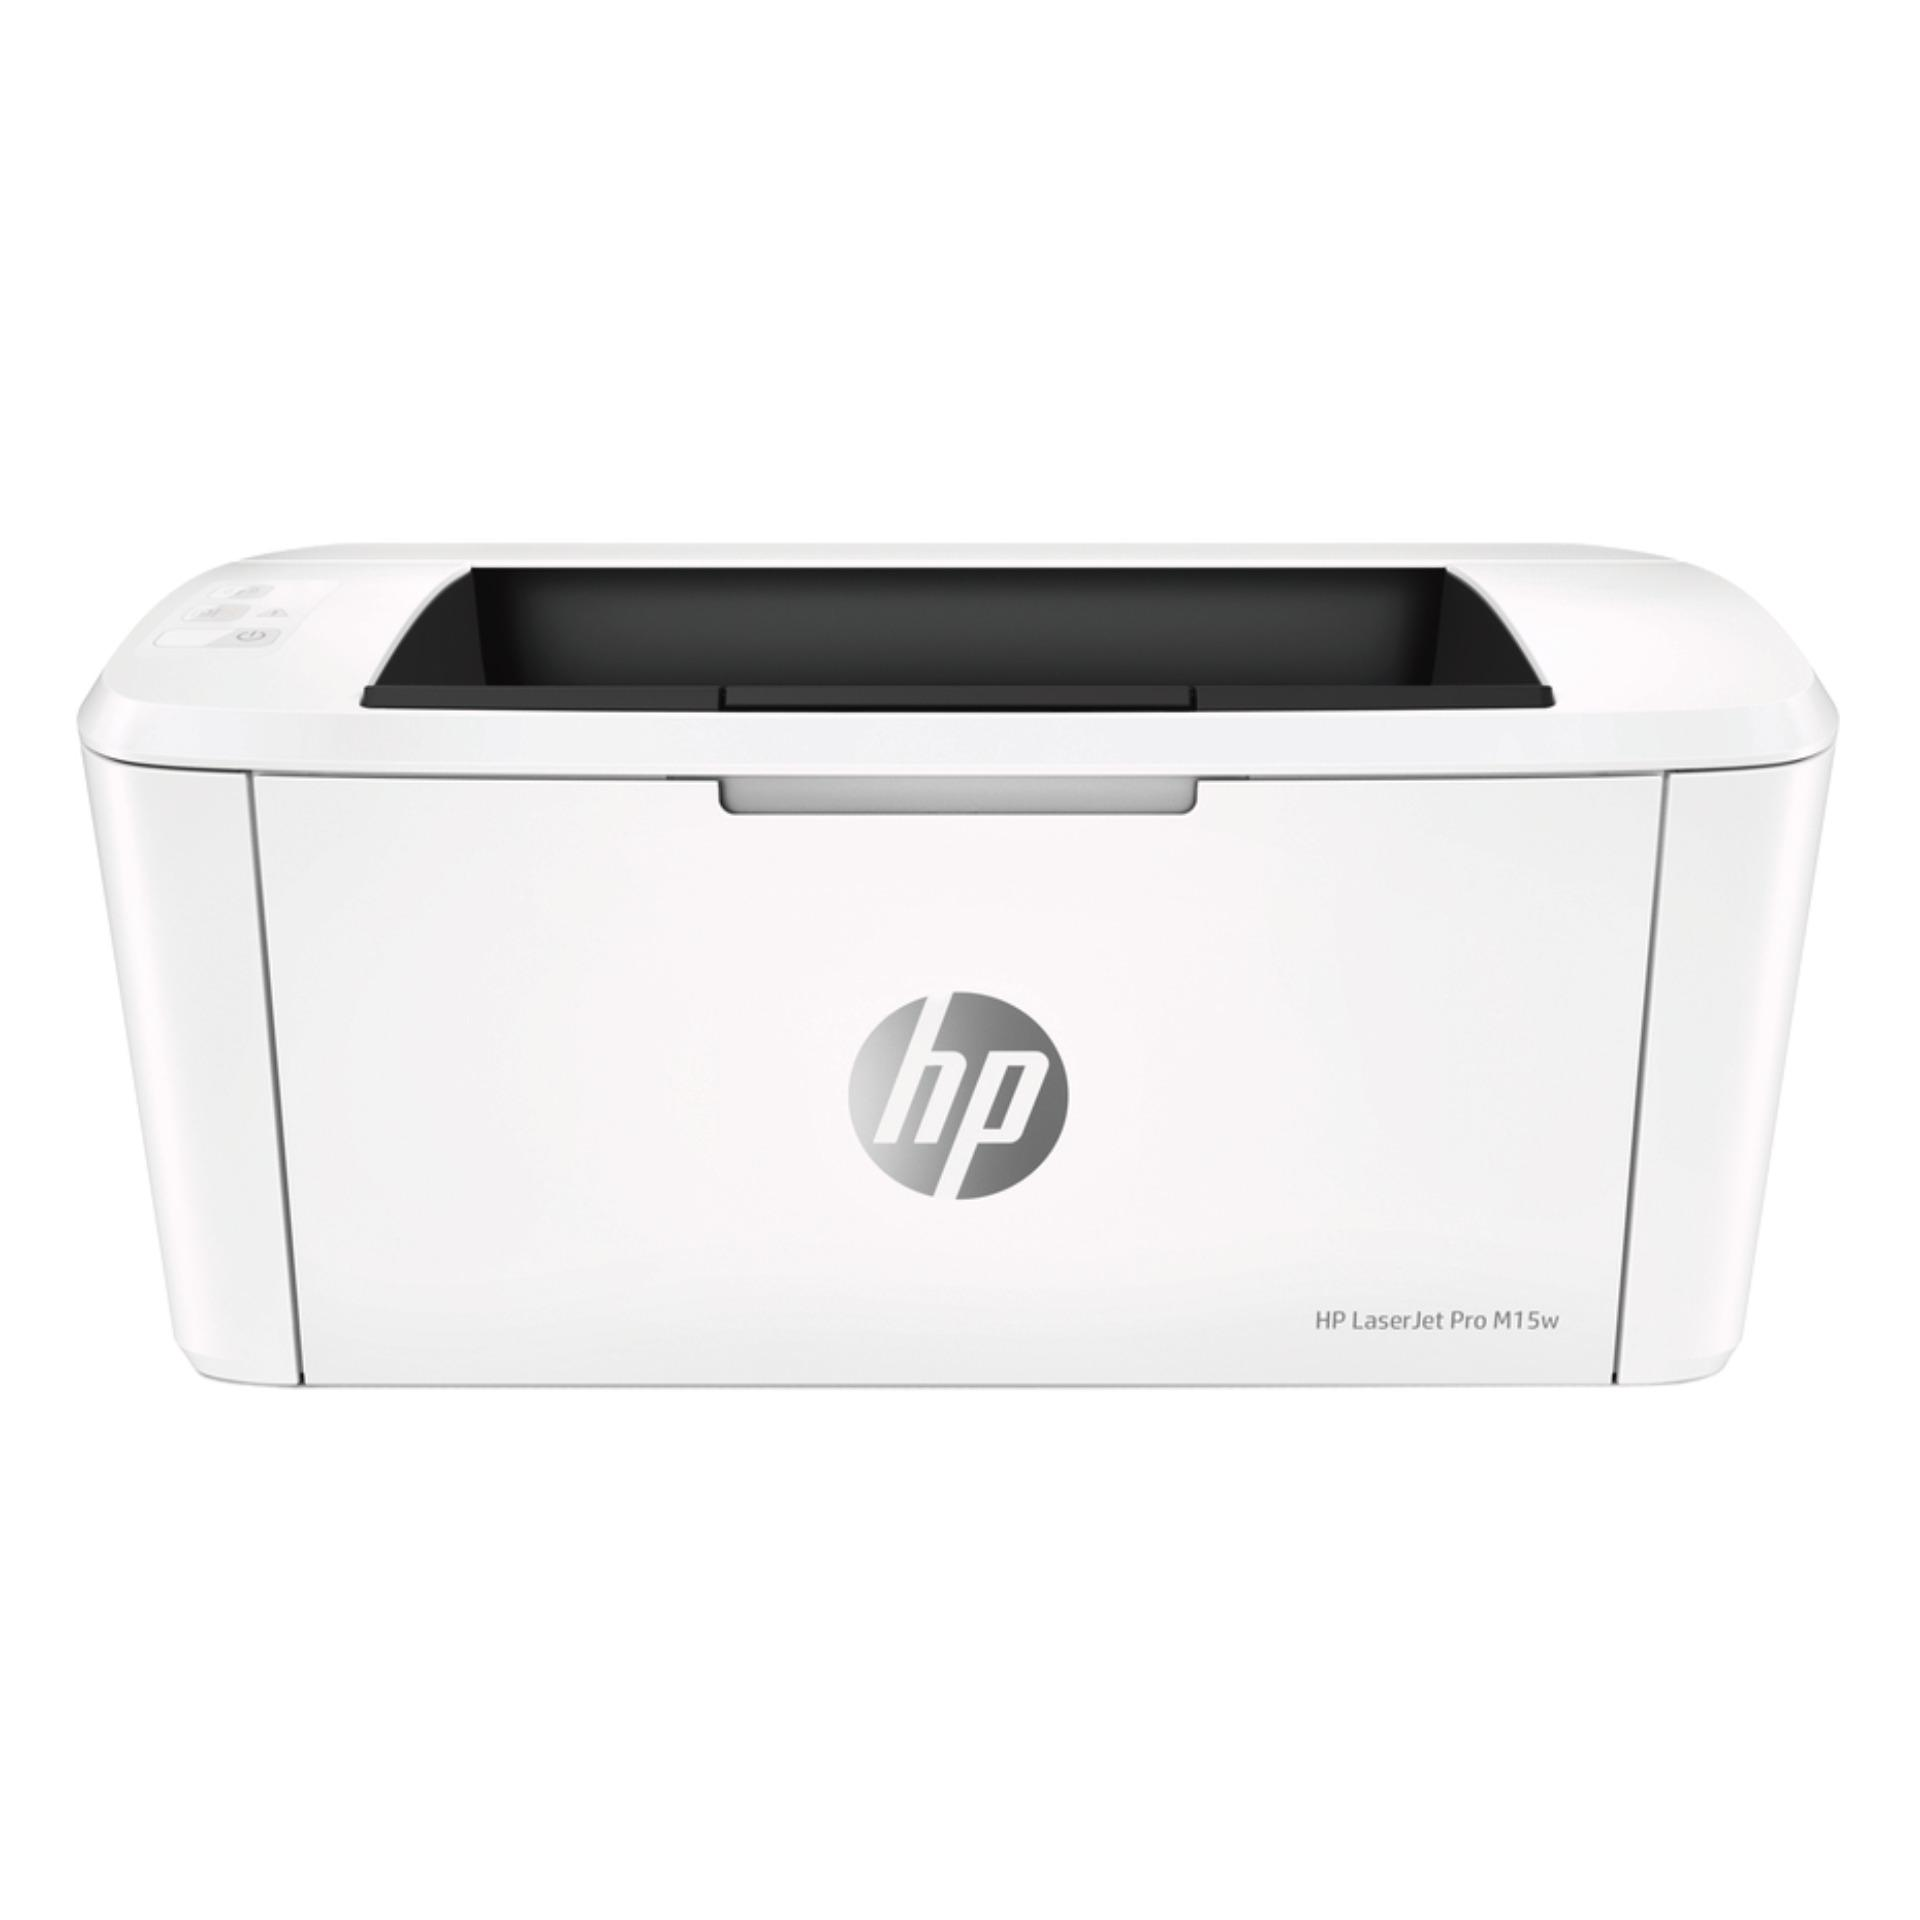 Multi Function Printers For Sale All In One Prices Hp Officejet 7110 Printer Print Web Wifi Laserjet Pro M15w Wireless